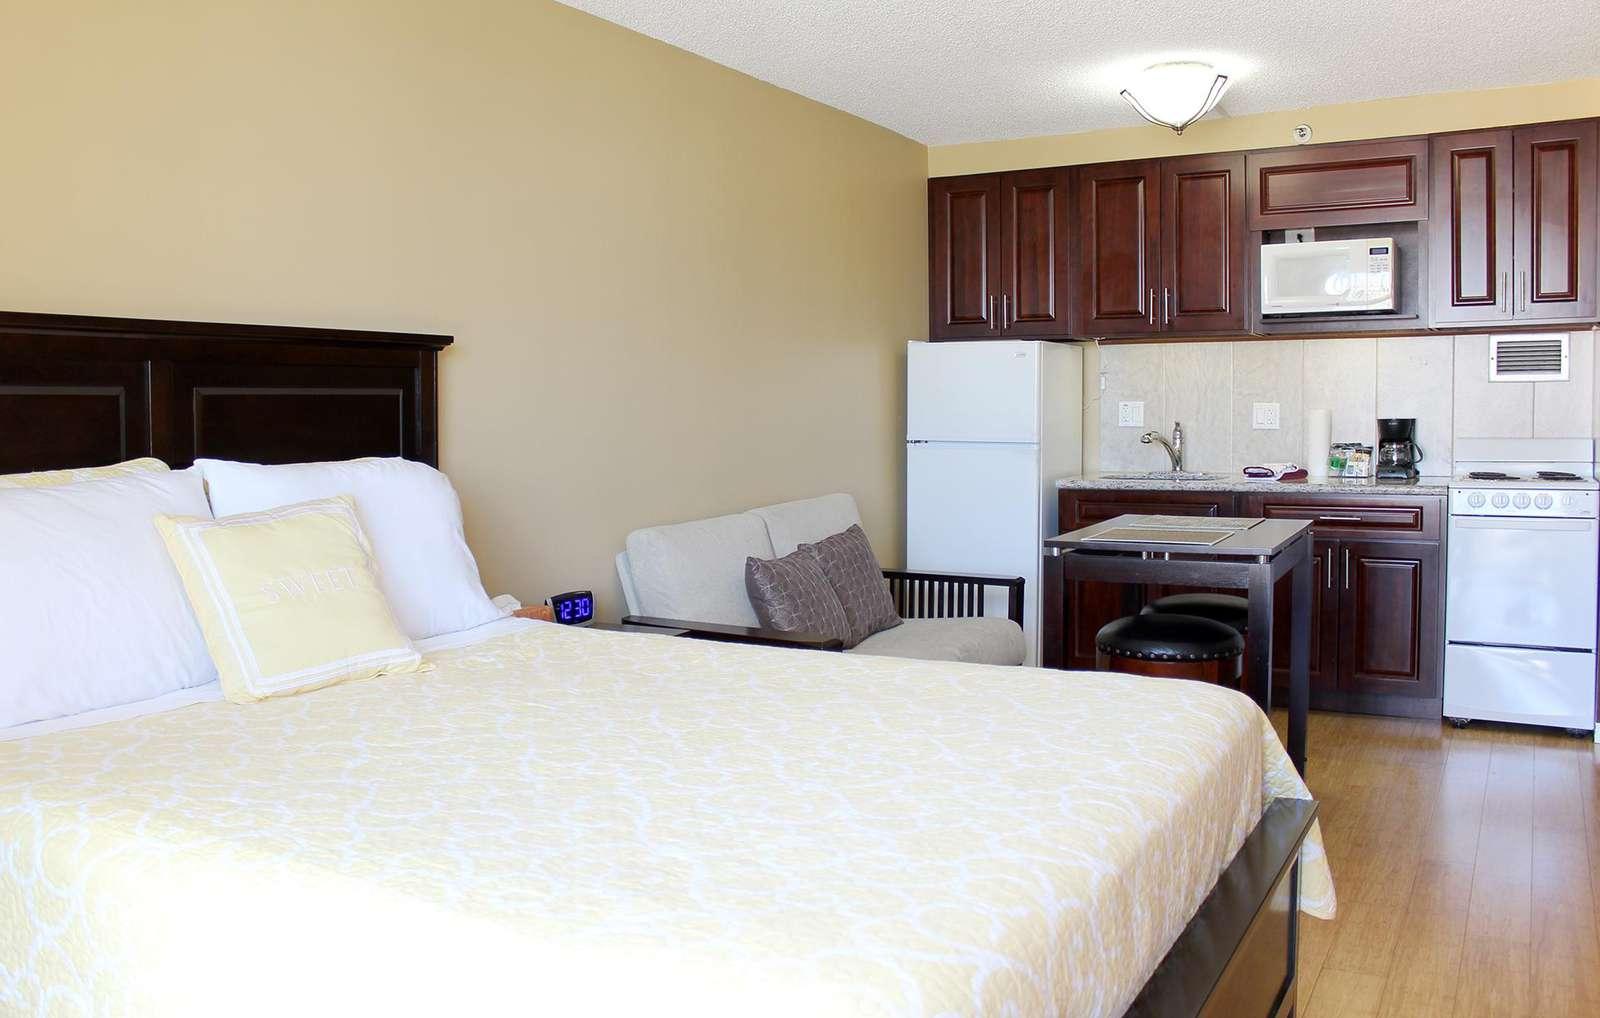 Studio Suite with kitchen area